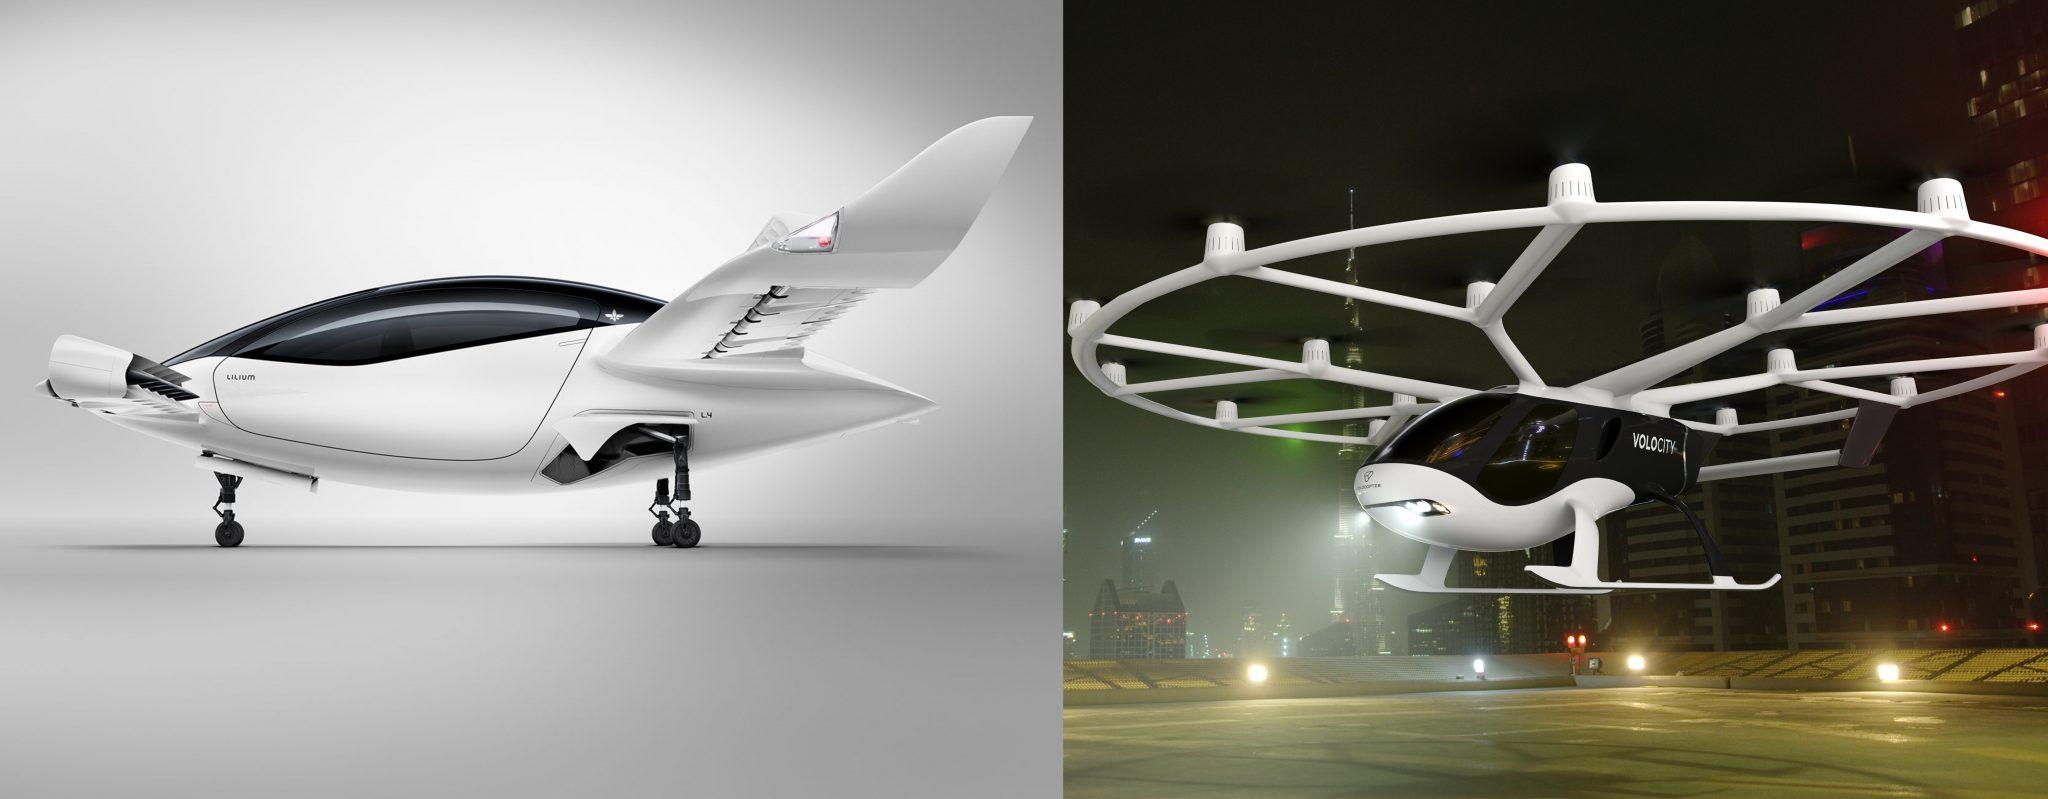 Lilium vs Volocopter